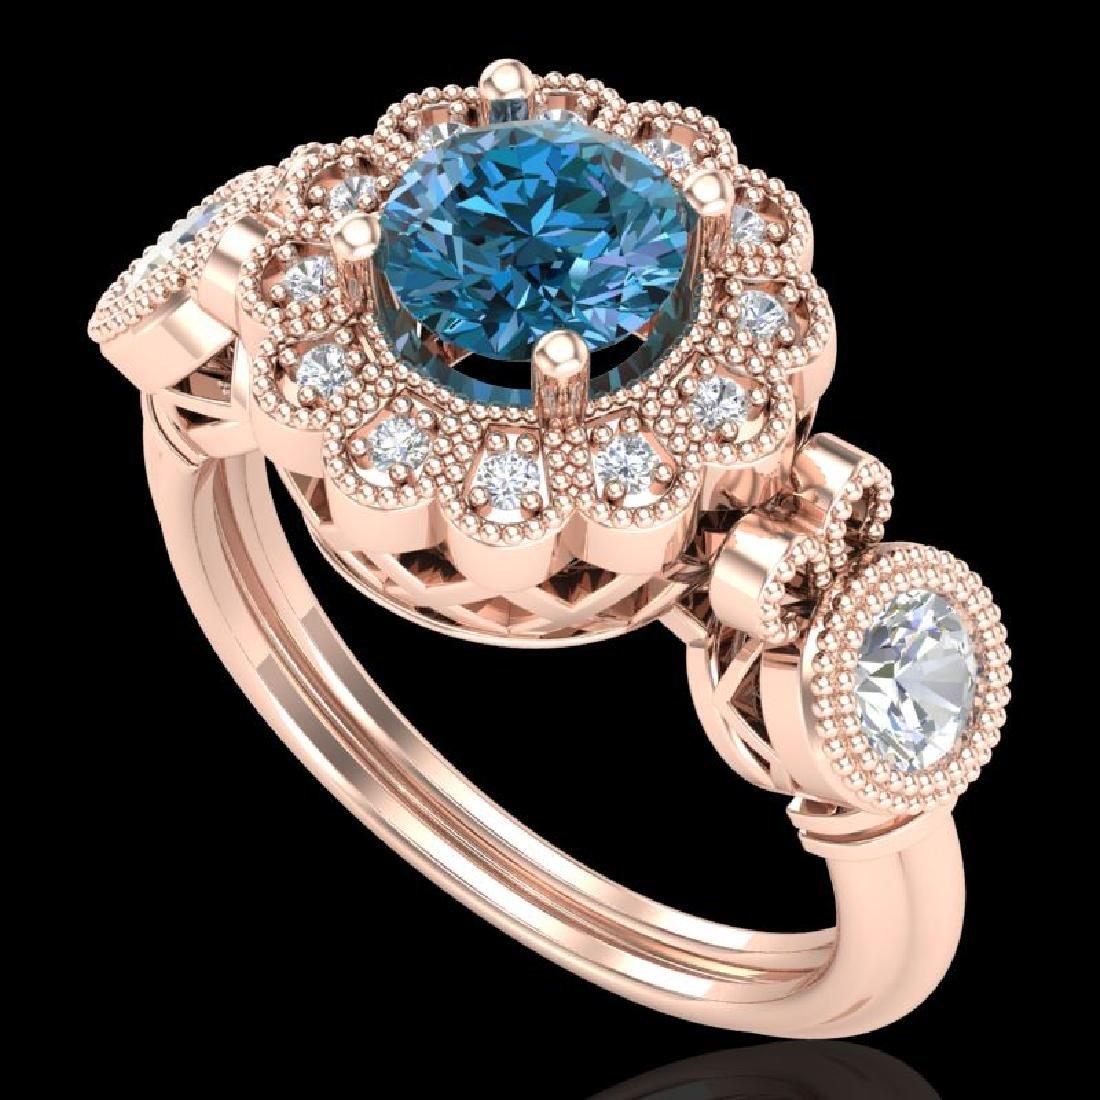 1.5 CTW Intense Blue Diamond Solitaire Art Deco 3 Stone